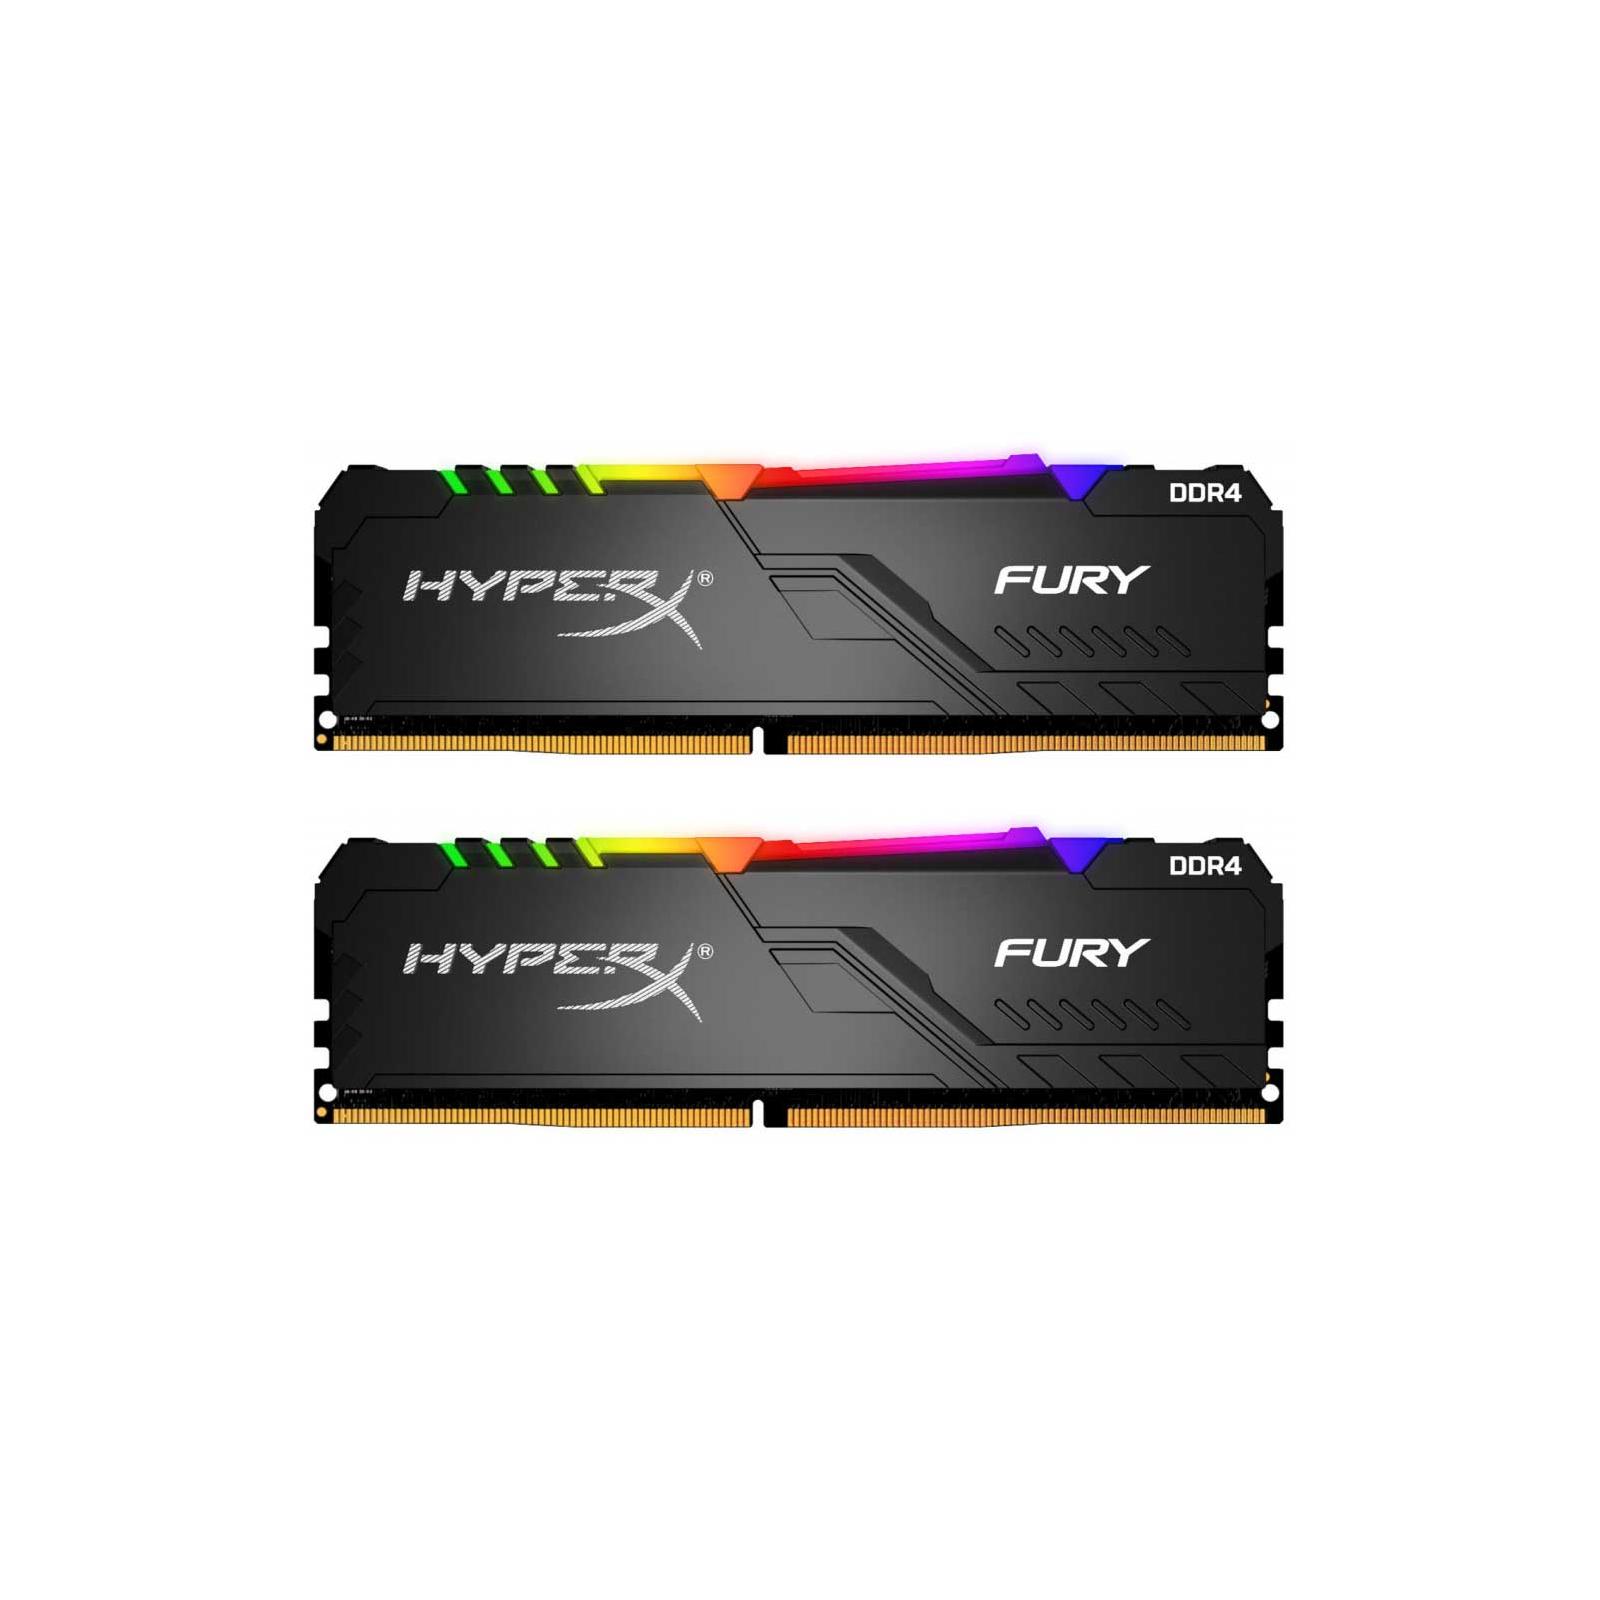 Модуль памяти для компьютера DDR4 16GB (2x8GB) 2400 MHz HyperX Fury RGB HyperX (Kingston Fury) (HX424C15FB3AK2/16)